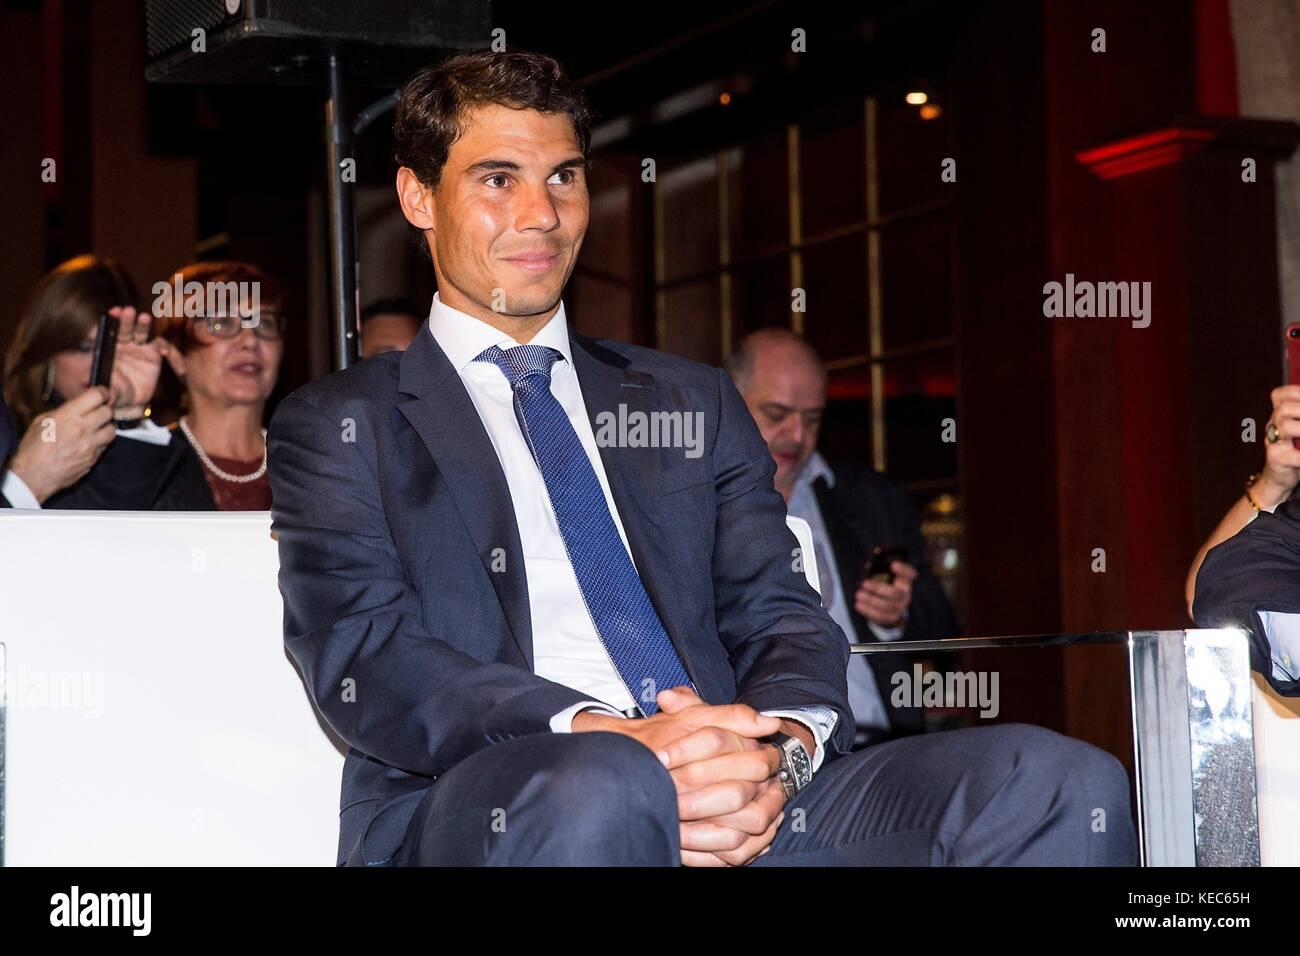 Madrid, Spain. 20th Oct, 2017. Spanish tennis player Rafael Nadal receives one of the awards of El Espanol newspaper - Stock Image